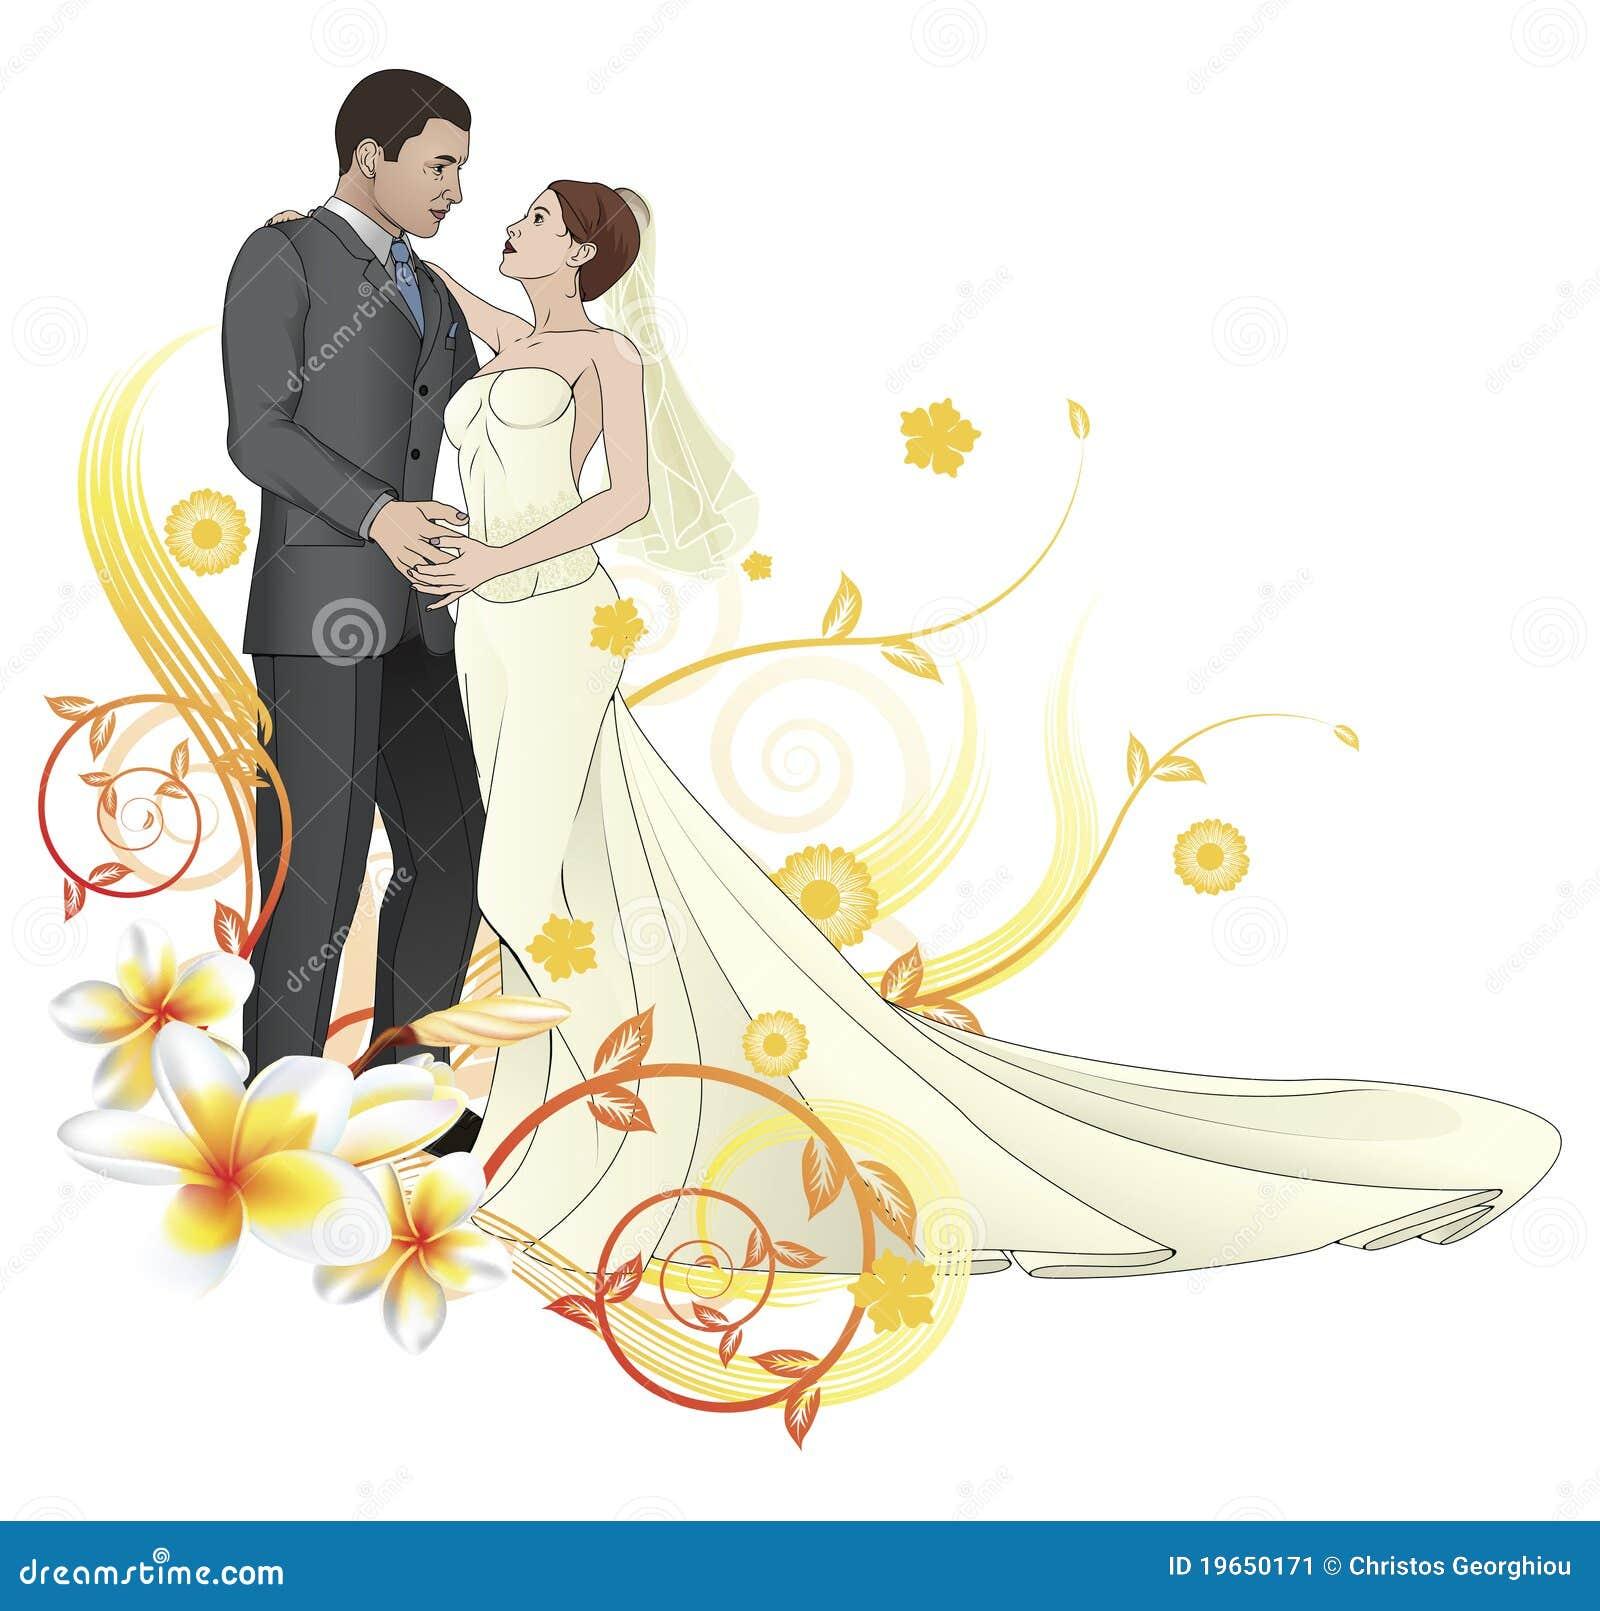 Bride And Groom Dancing Floral Background